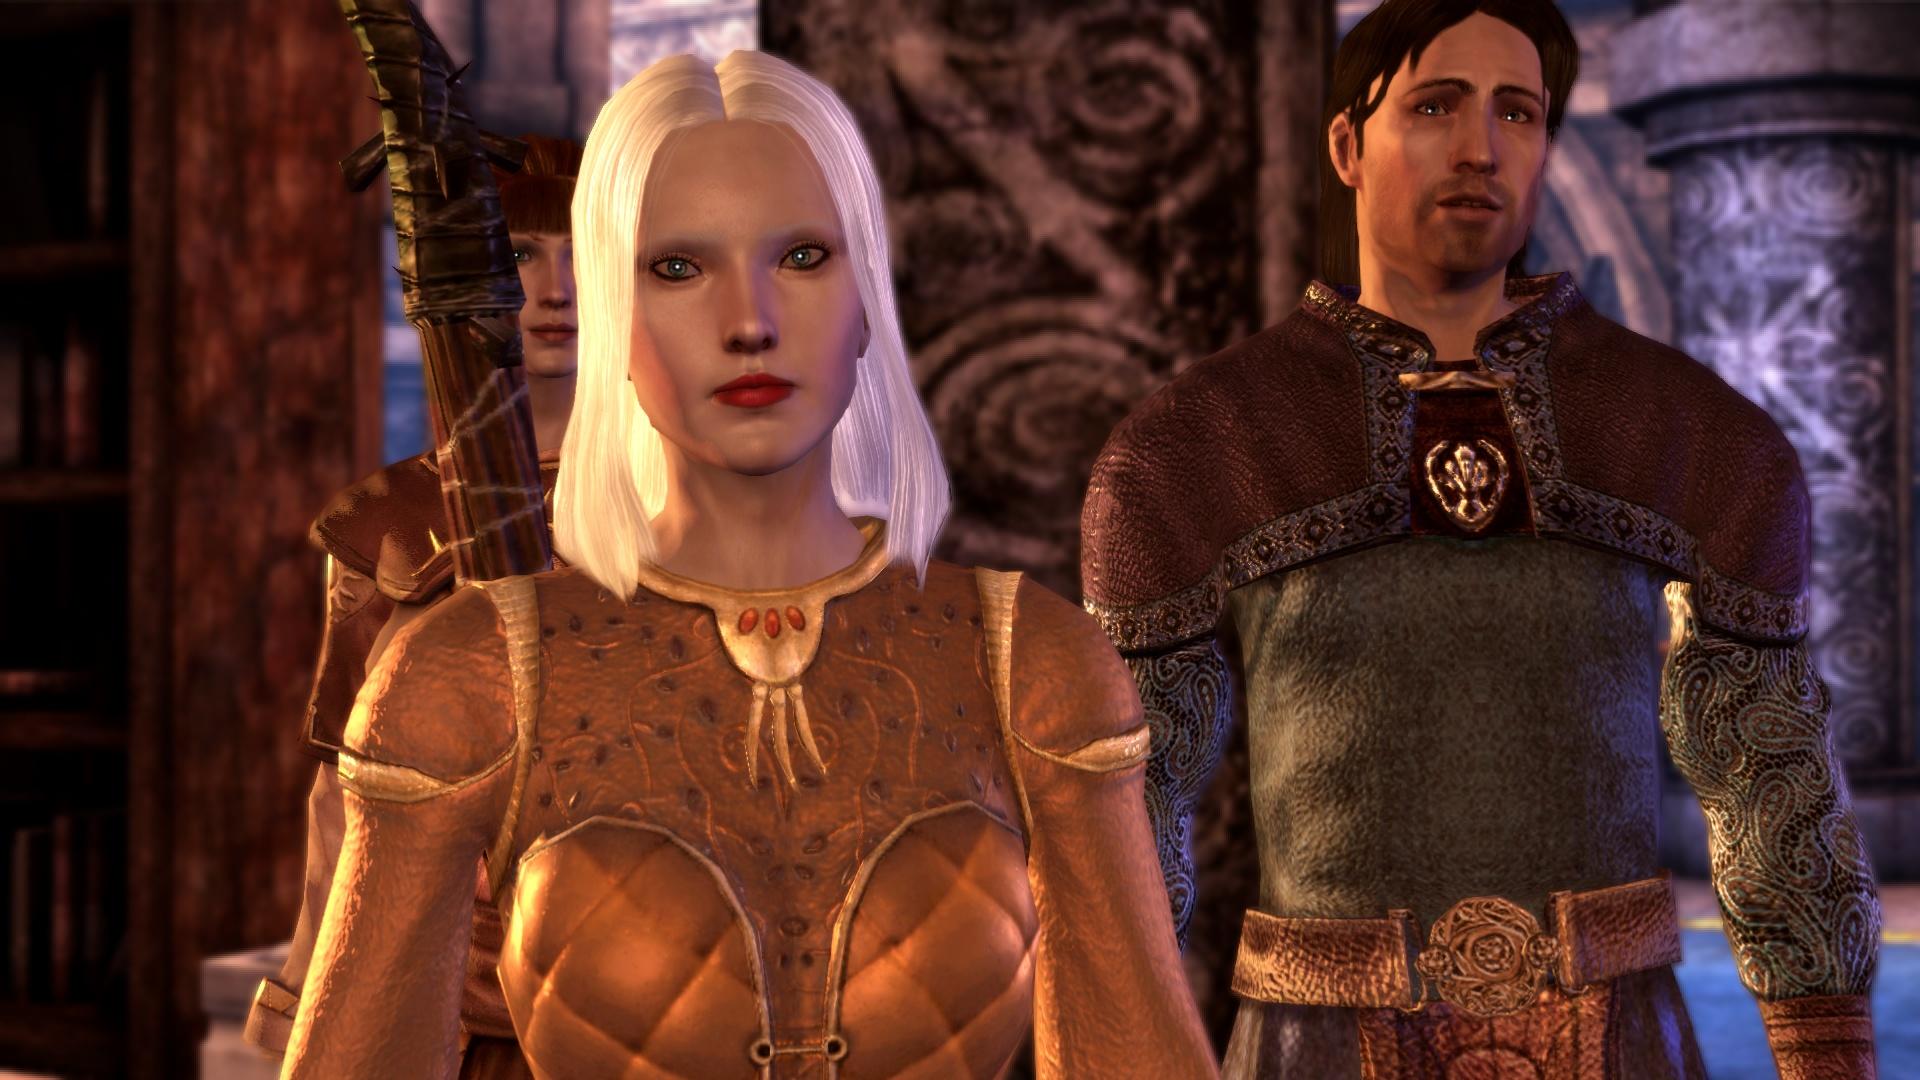 Les saga Dragon Age & Mass Effect - Page 2 1447193984-screenshot20151110231355873